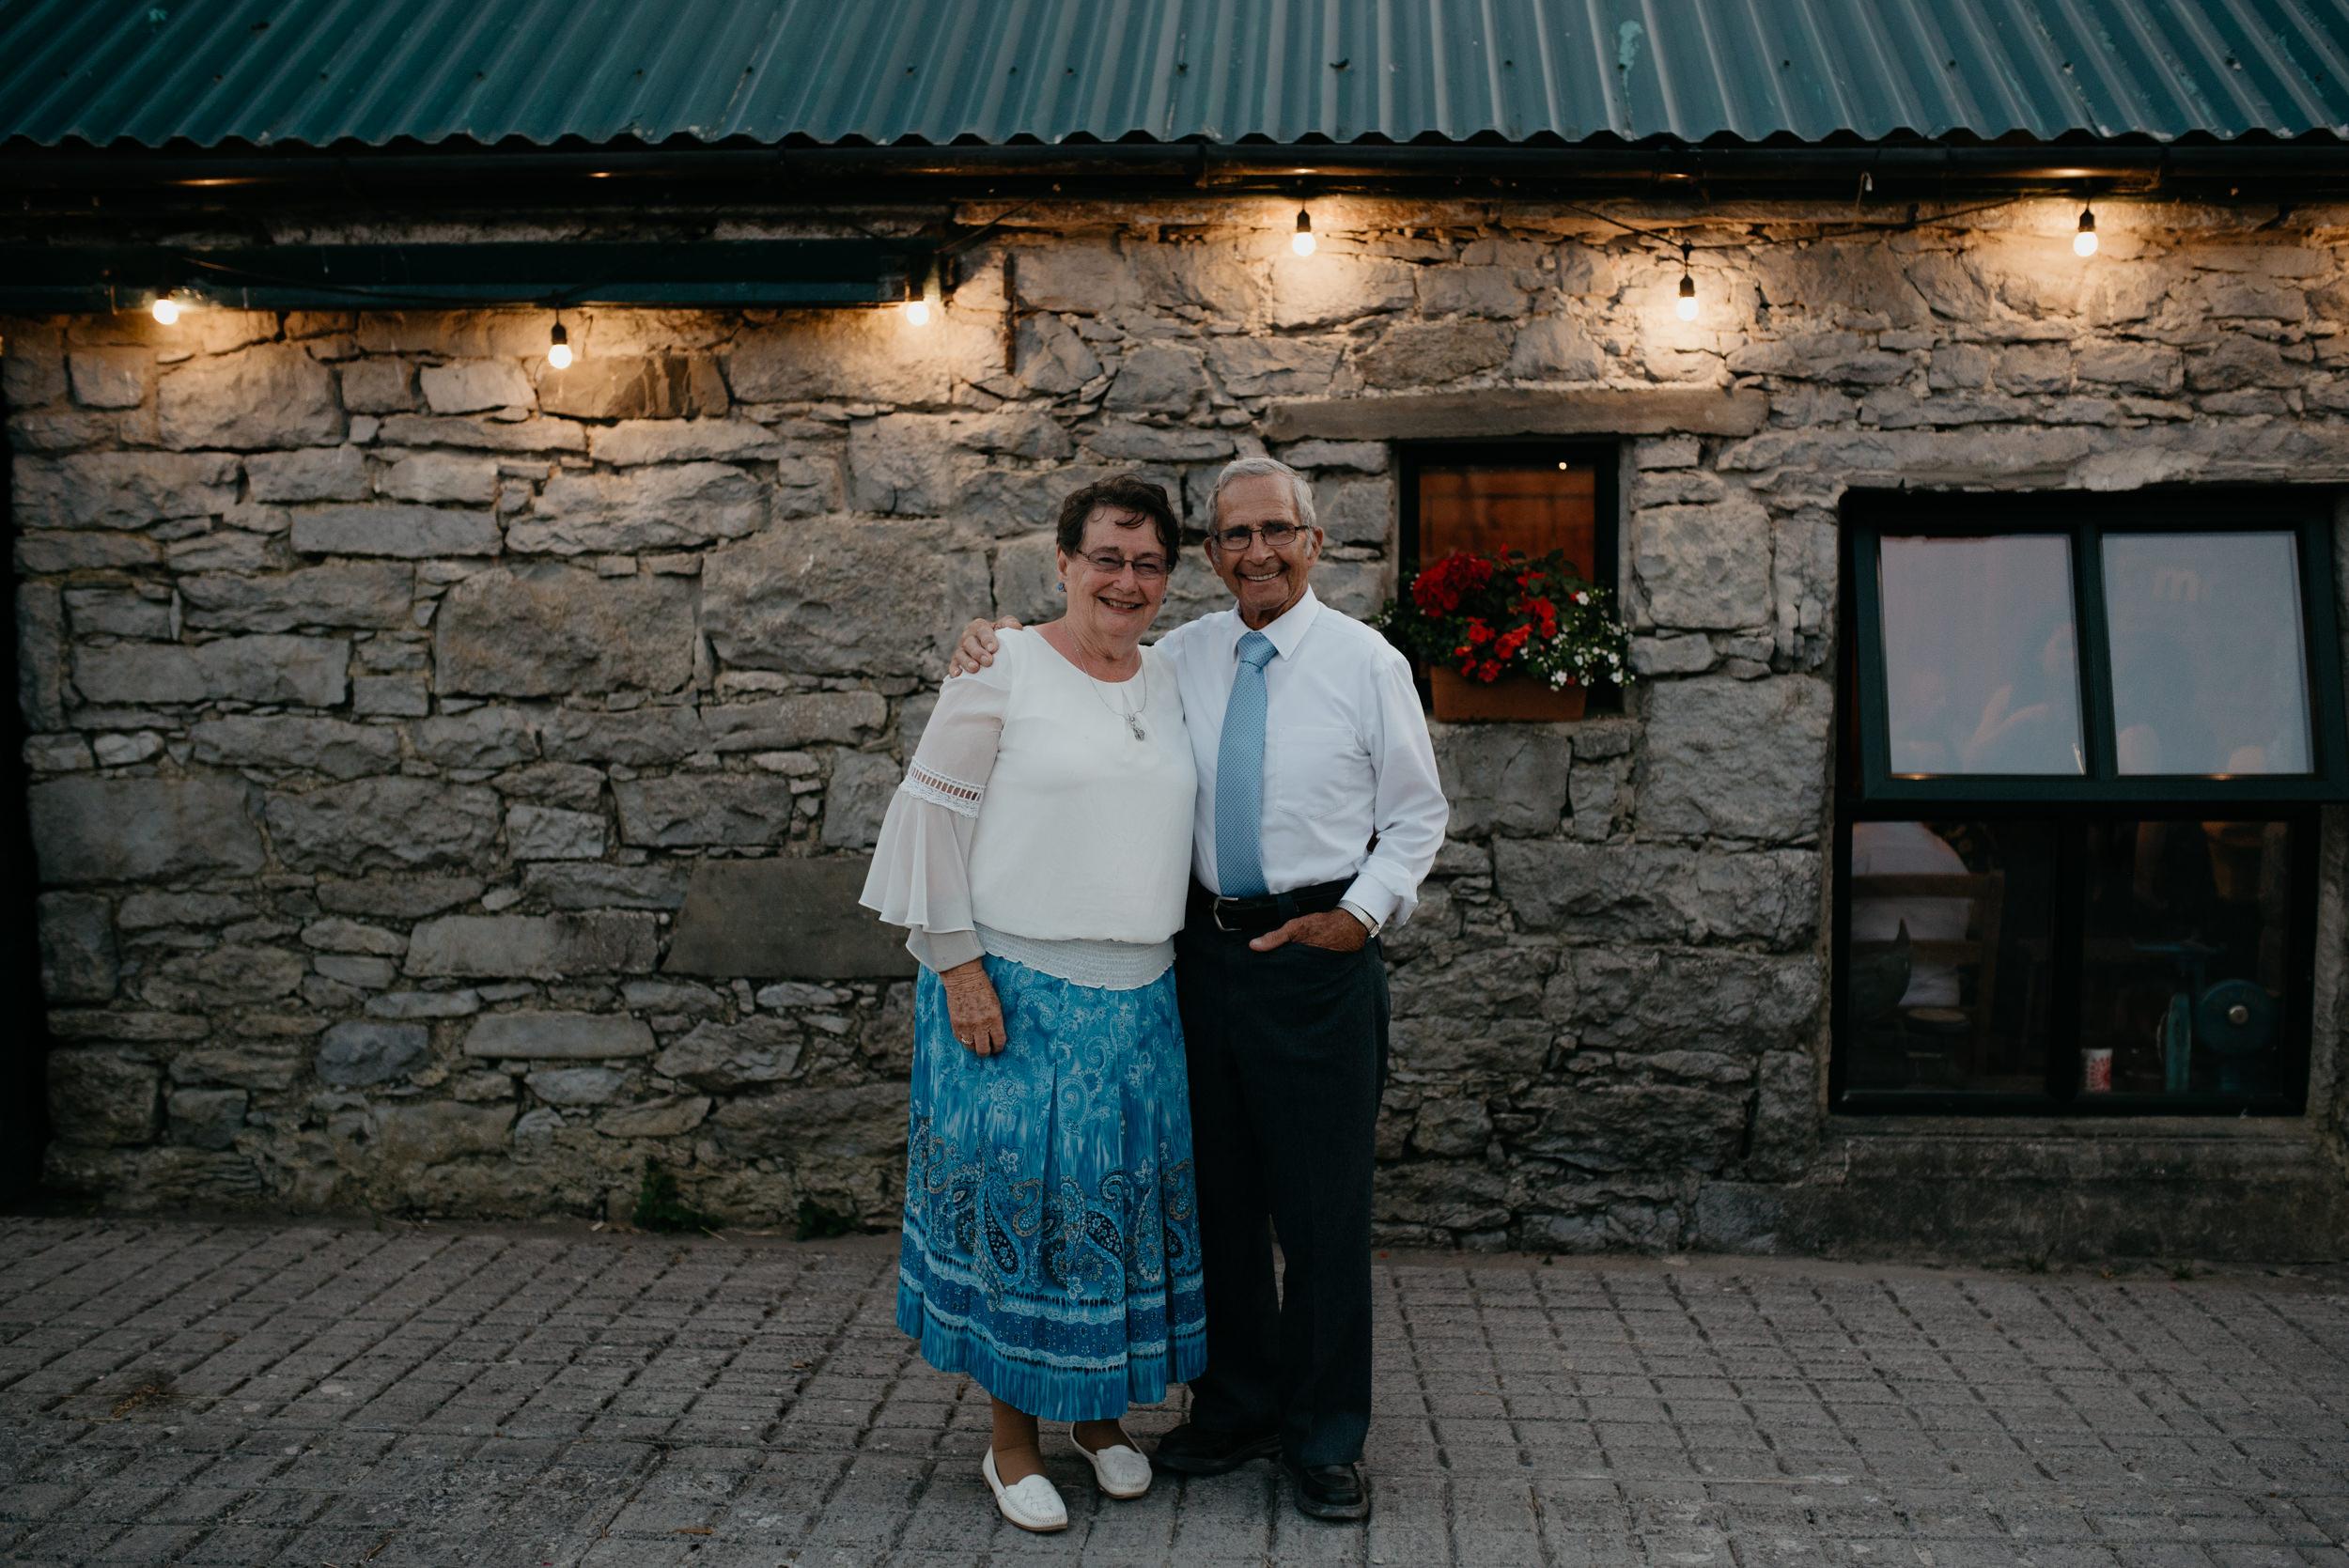 Wedding reception at Vaughan's pub in Ireland. Ireland destination wedding and elopement photographer. County Clare, Ireland wedding photographer. Cliffs of Moher destination elopement.